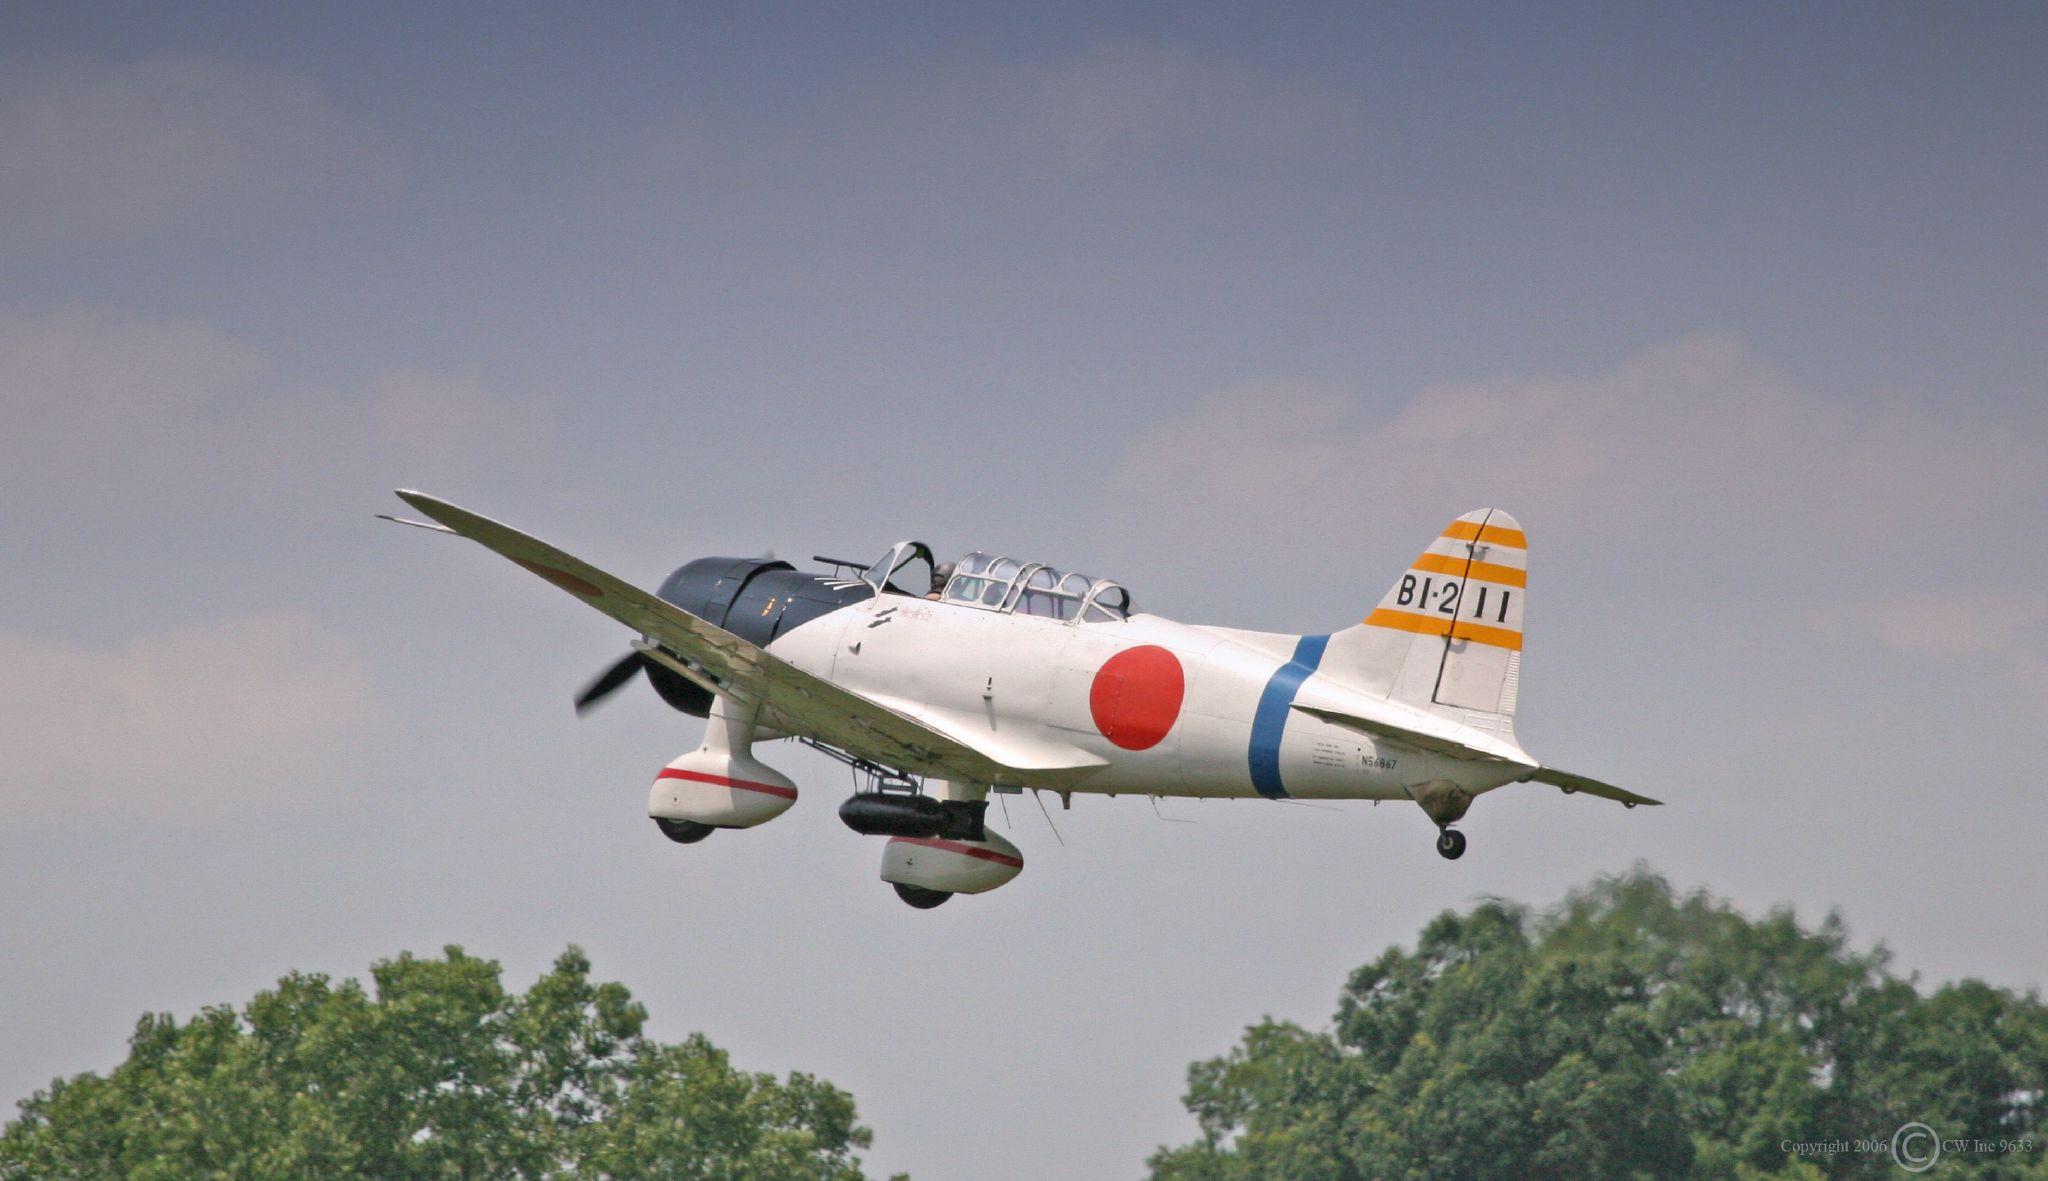 Aichi D3A Replica Airshow.jpg